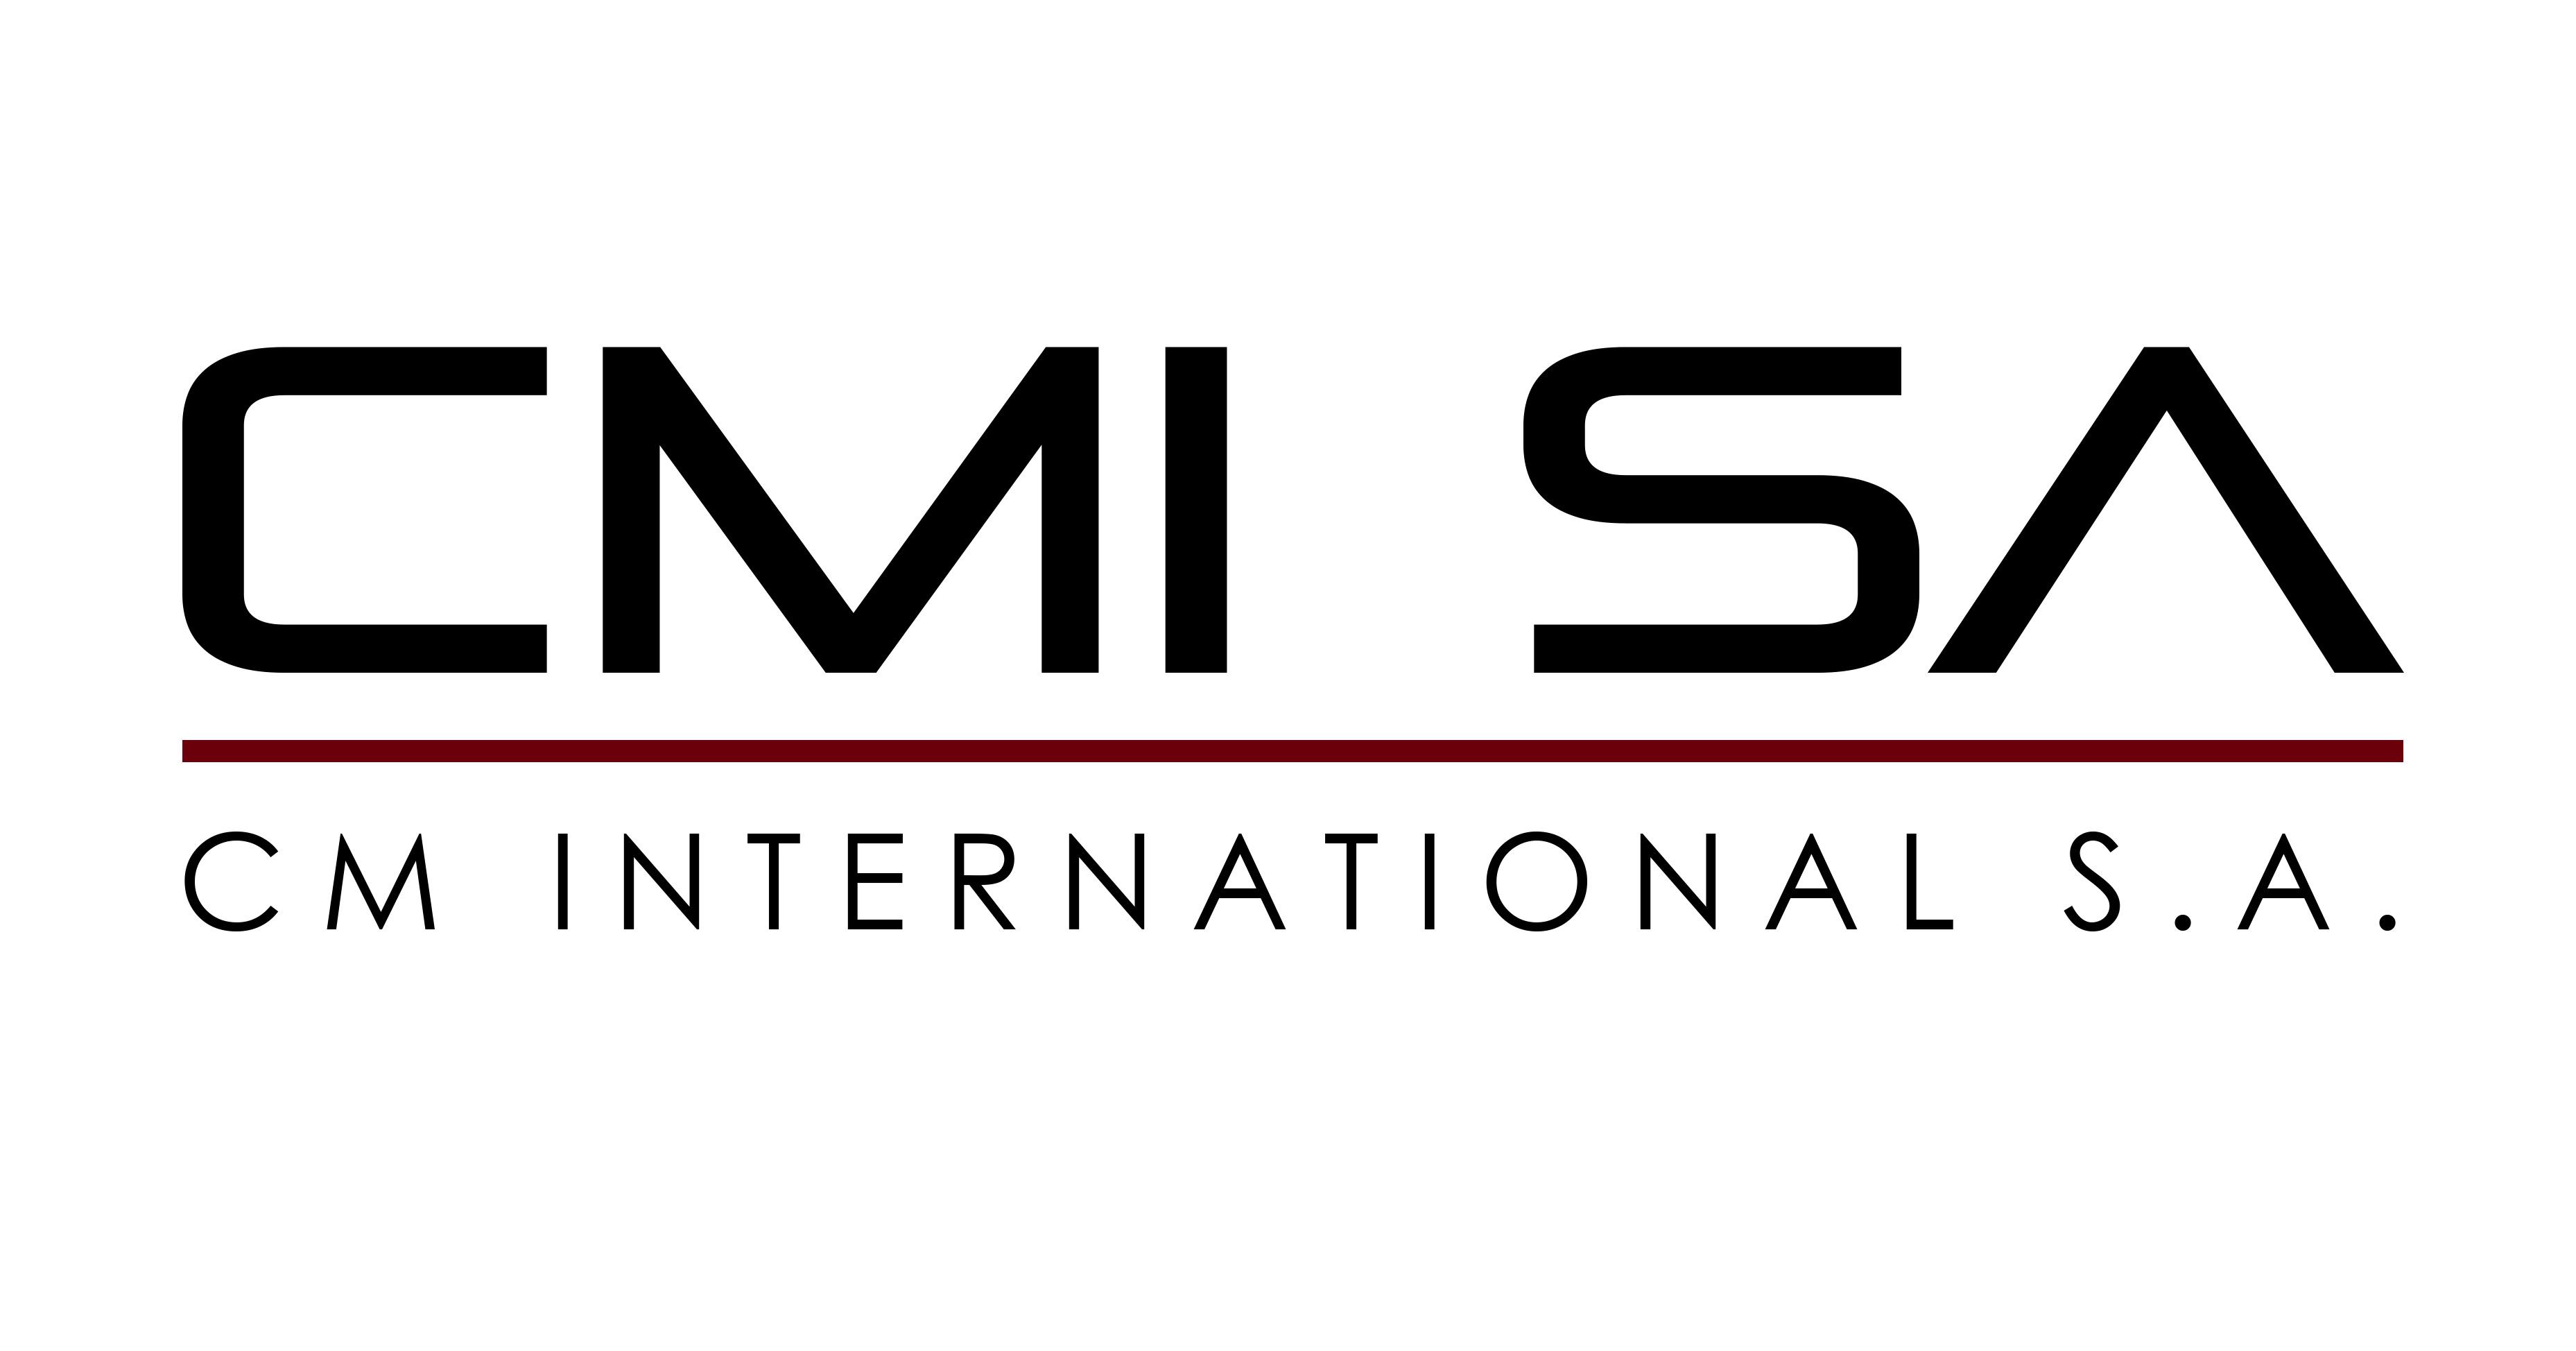 Rekomendacje dla CM International